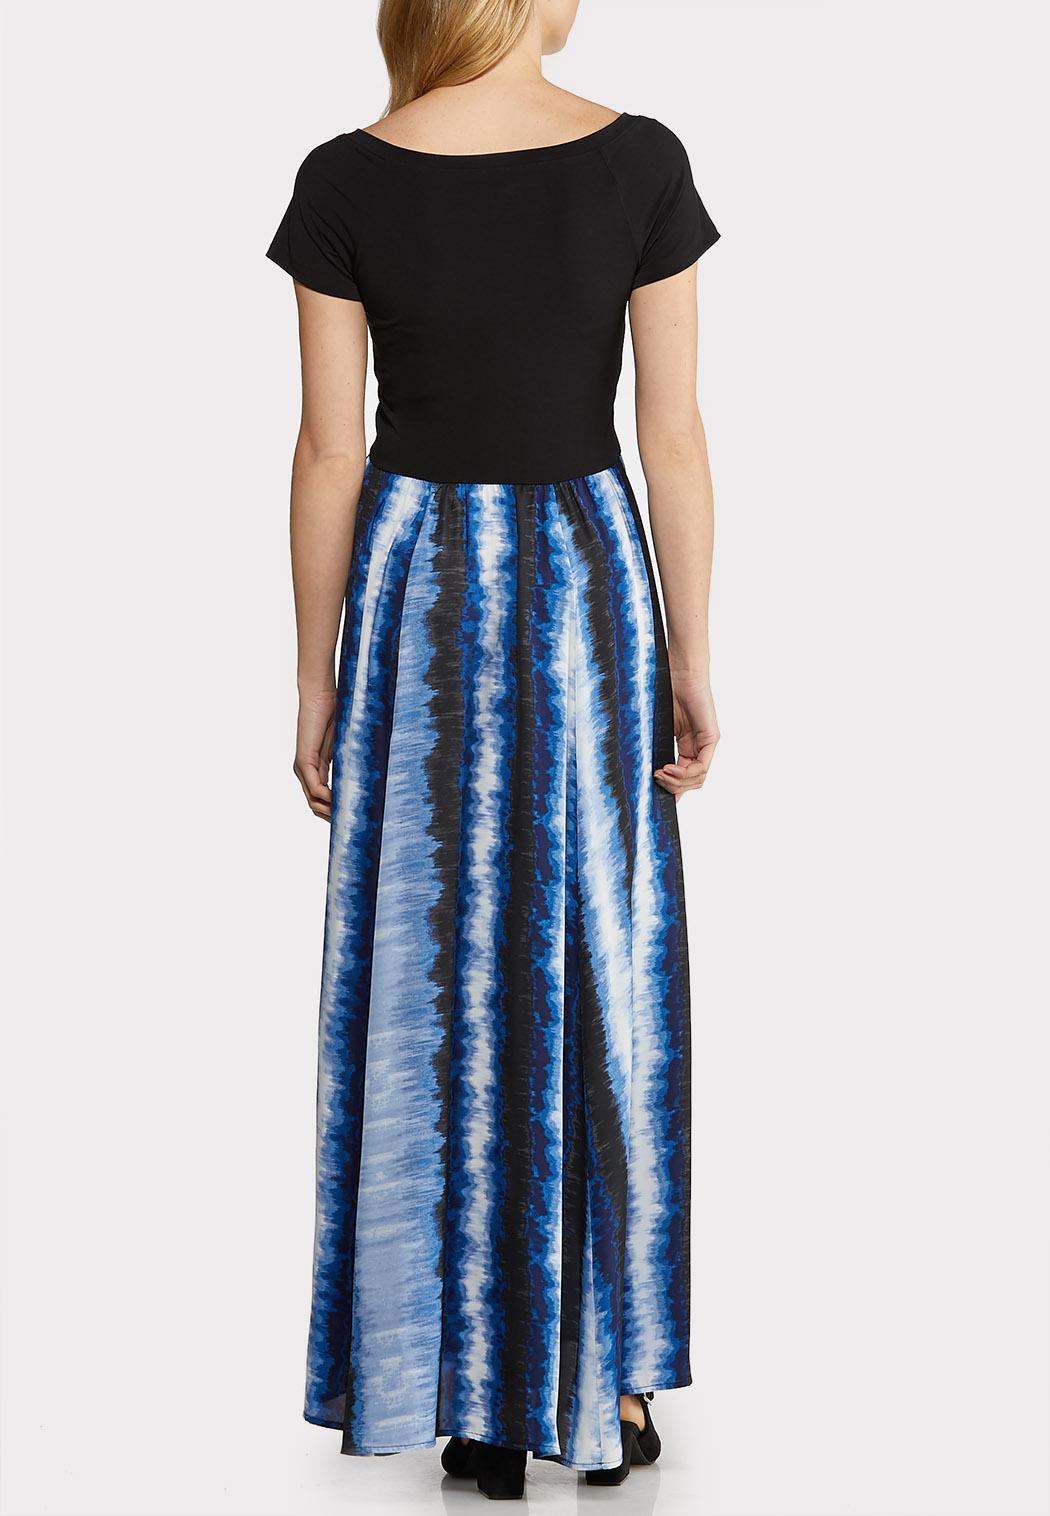 Plus Size Solid Tie Dye Maxi Dress (Item #44140792)